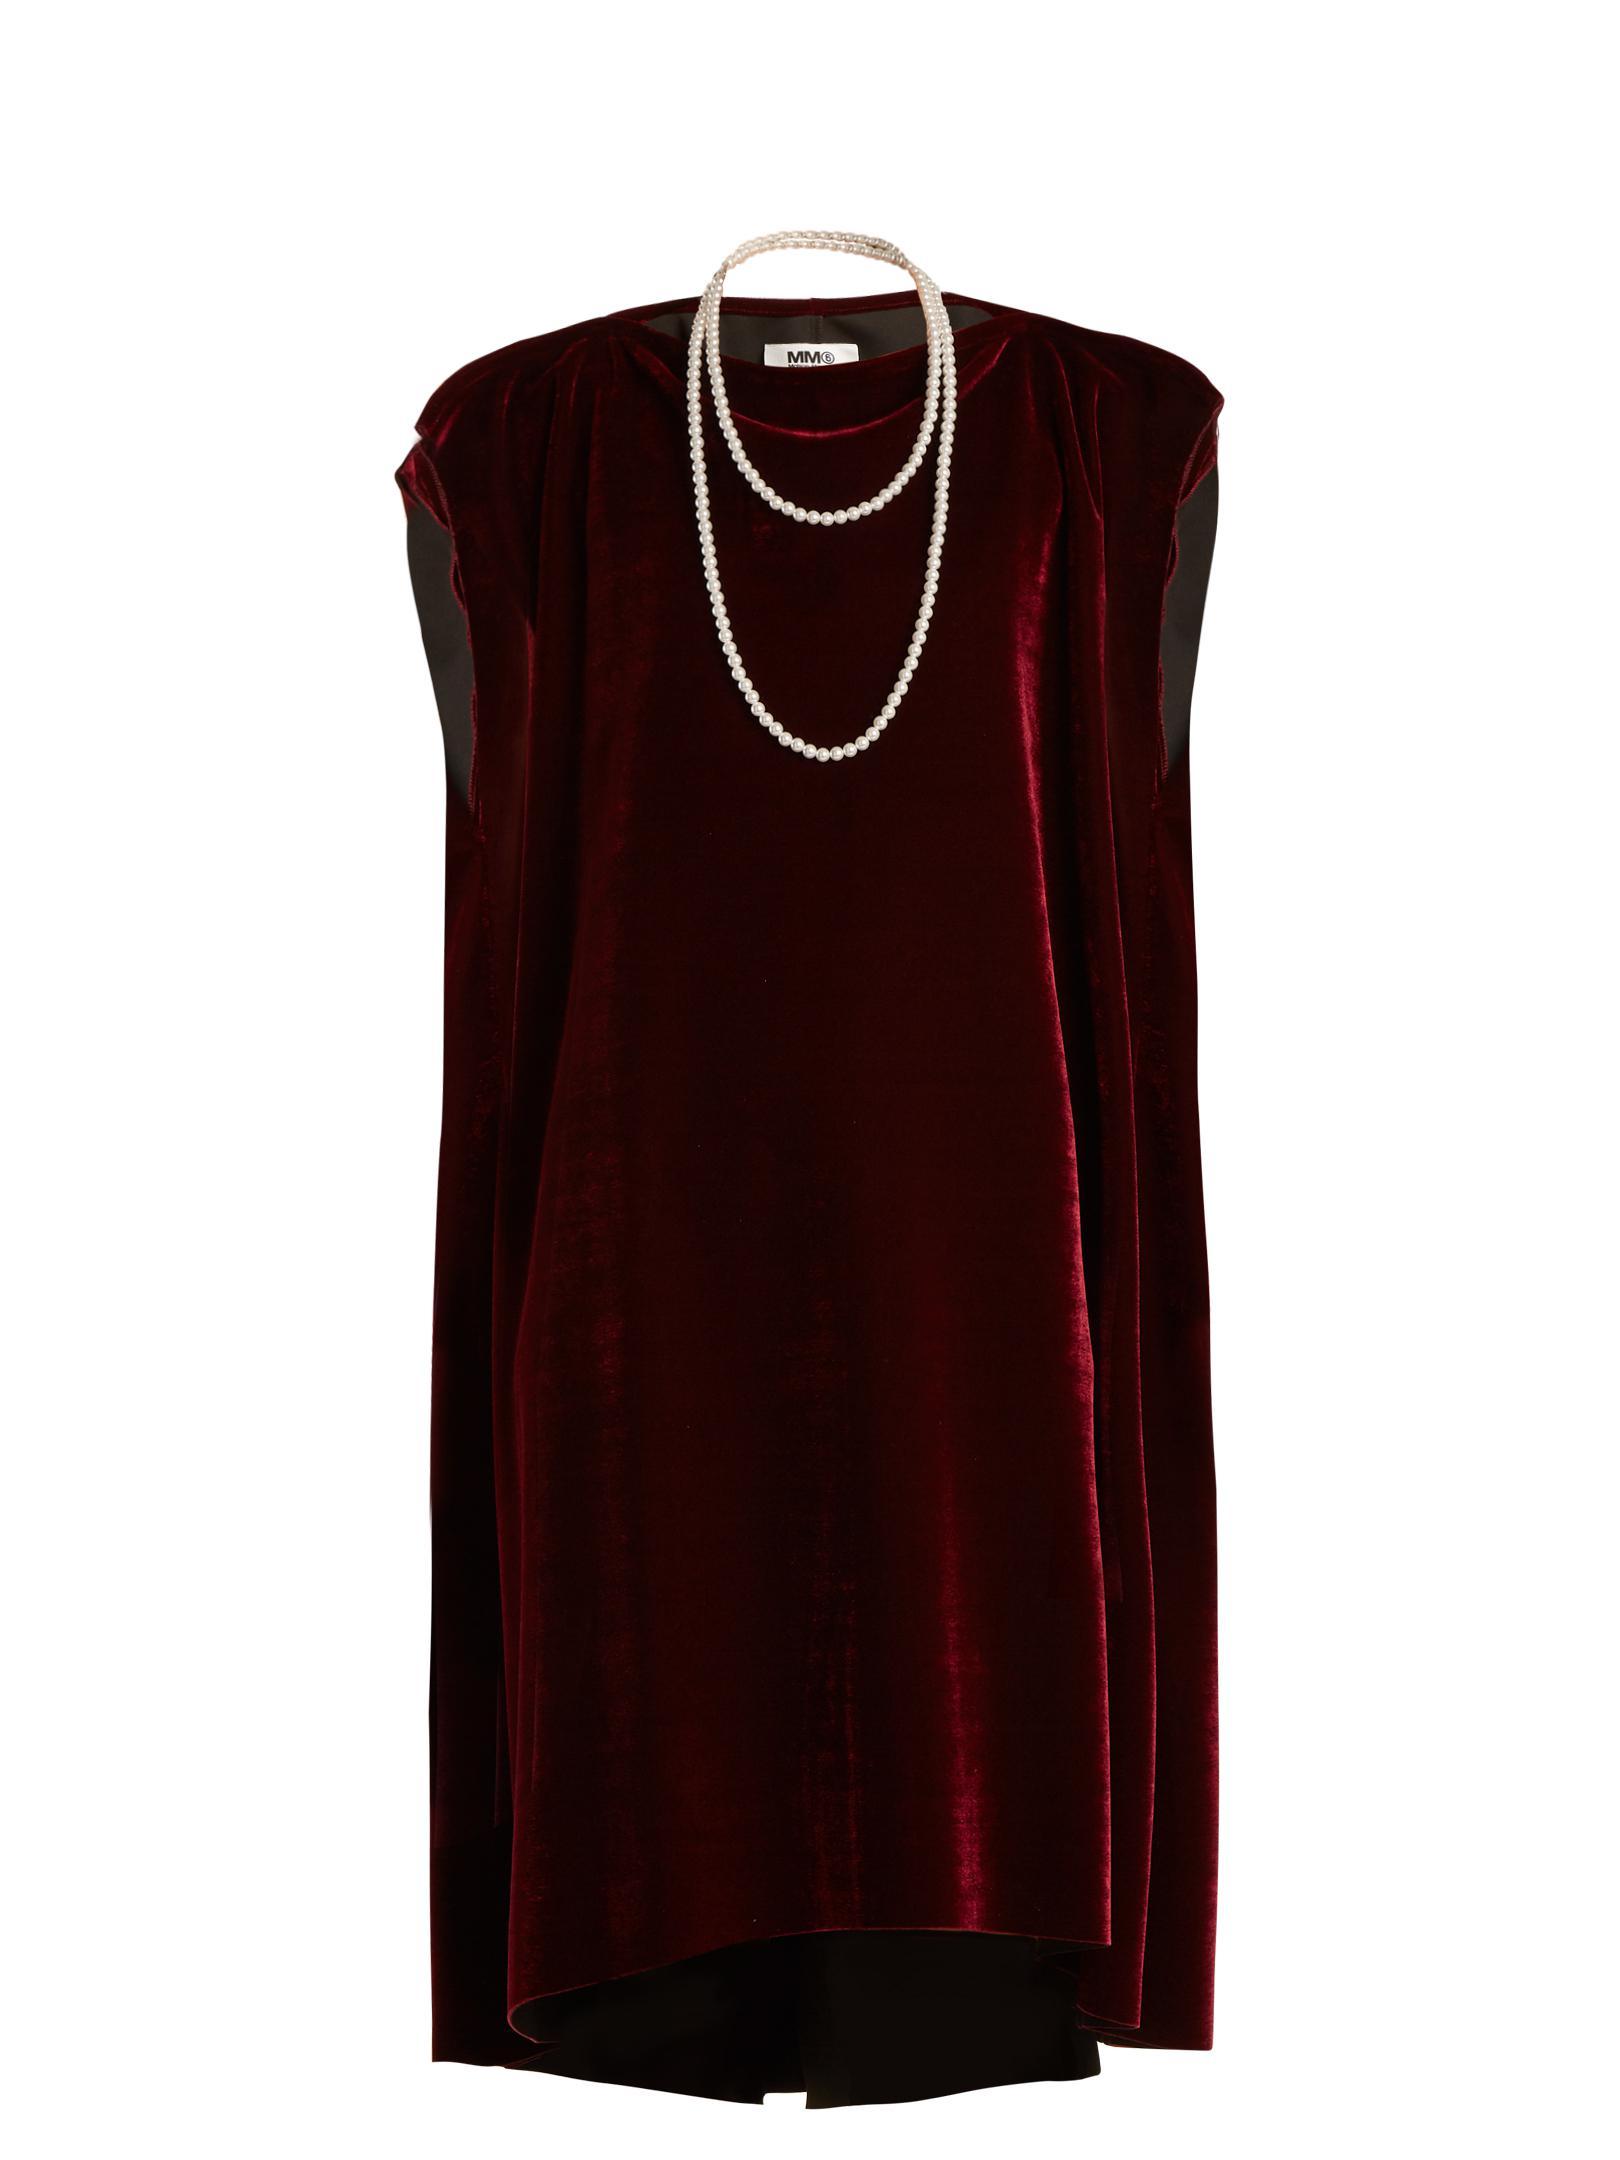 Faux pearl-embellished tie-waist velvet dress Maison Martin Margiela xUKvCy9